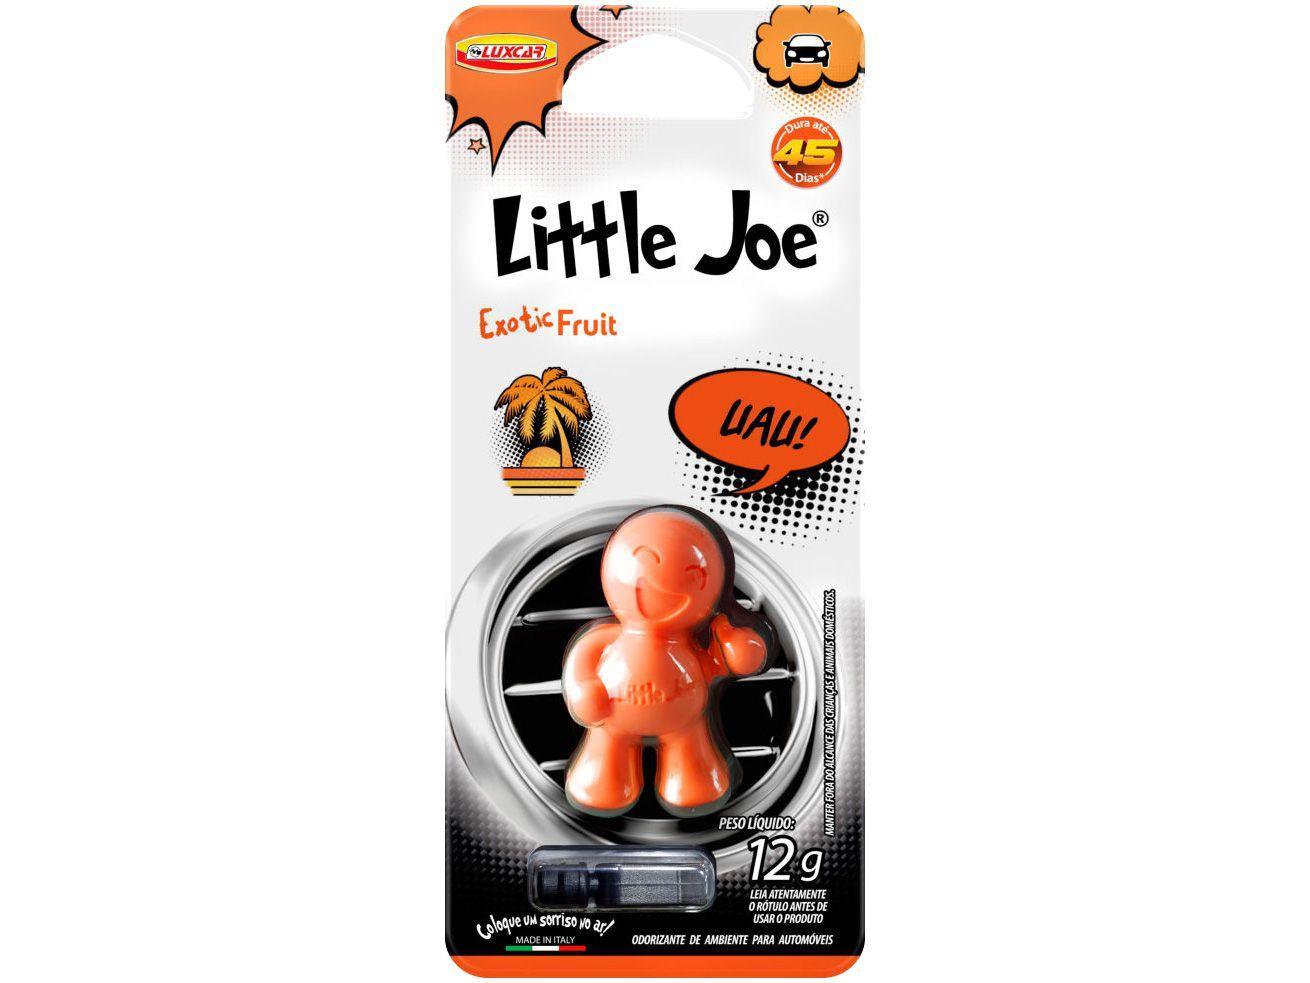 Odorizador Automotivo Plástico Injetado Luxcar - Little Joe Exotic Fruit